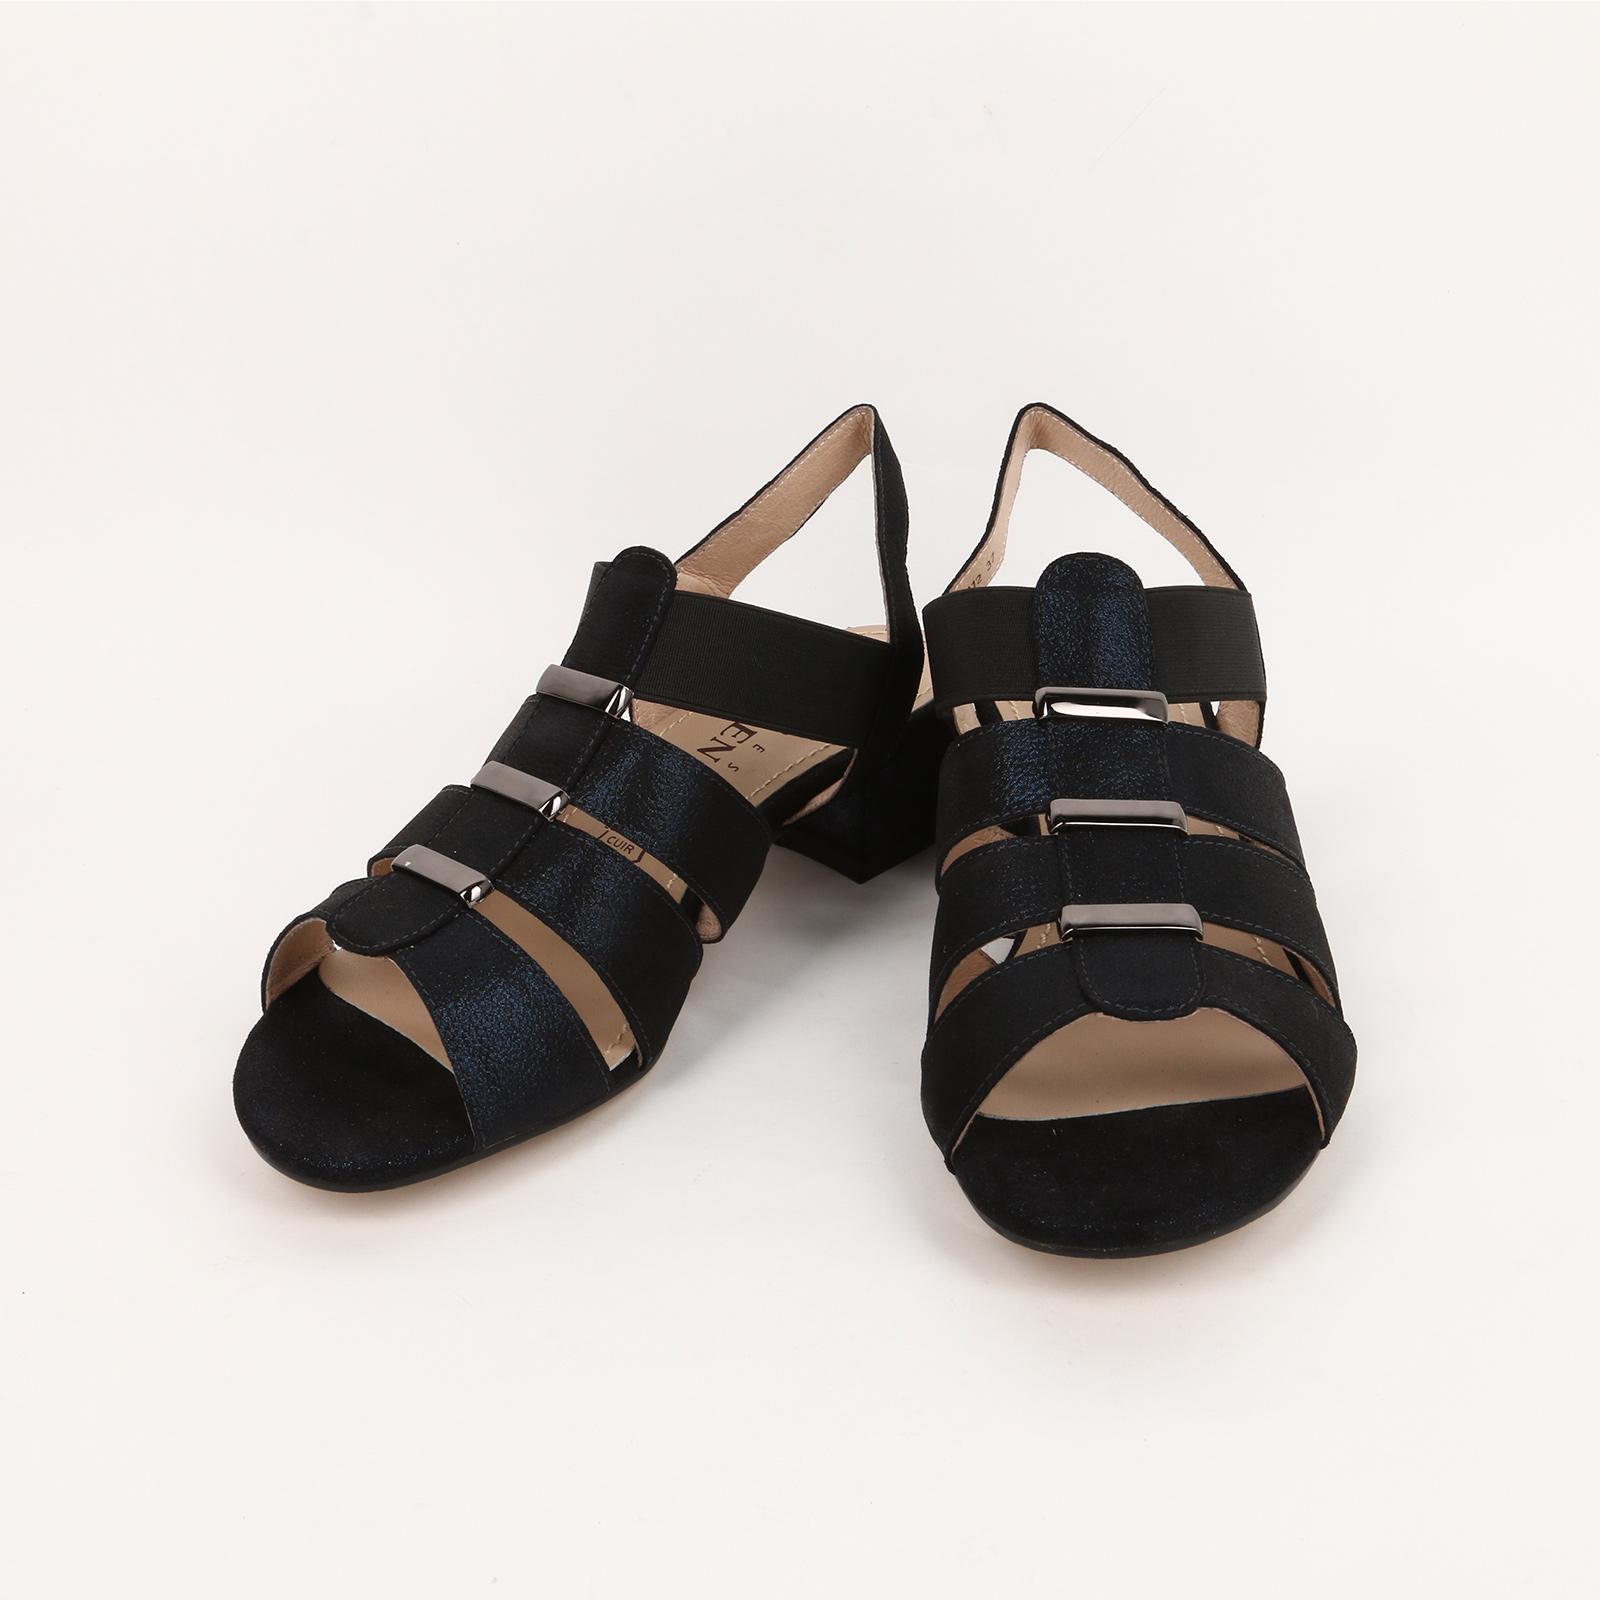 Босоножки женские на каблуке с ремешками